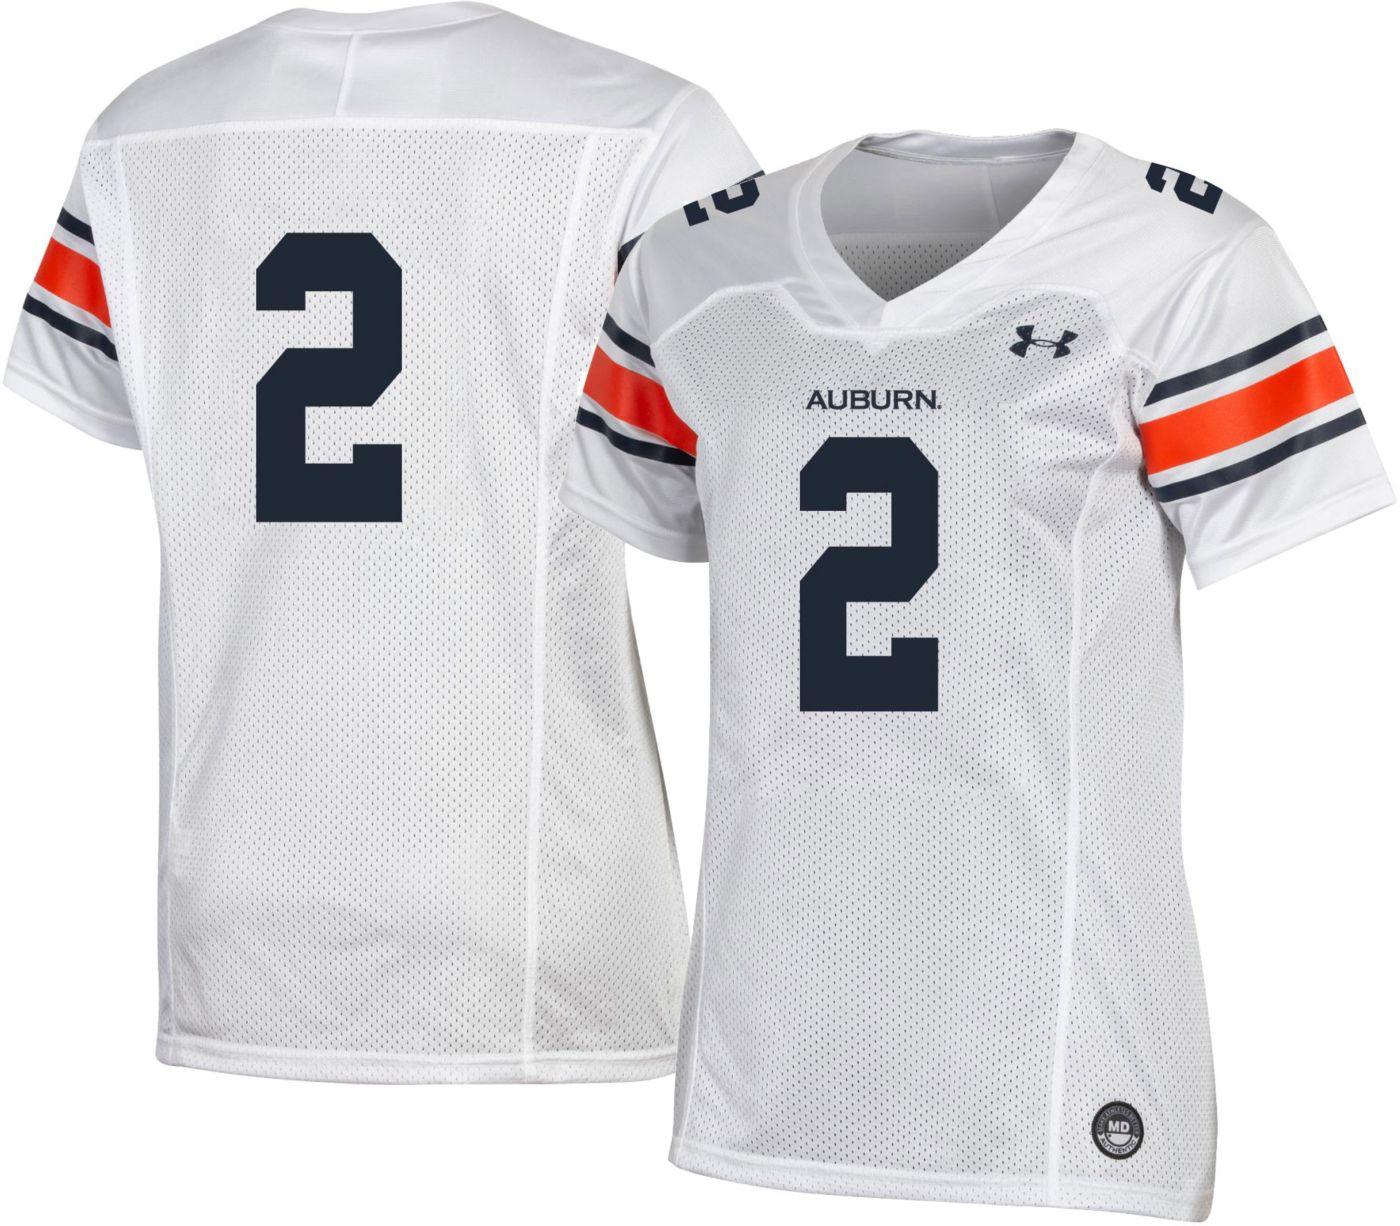 Under Armour Women's Auburn Tigers #2 Replica Football White Jersey